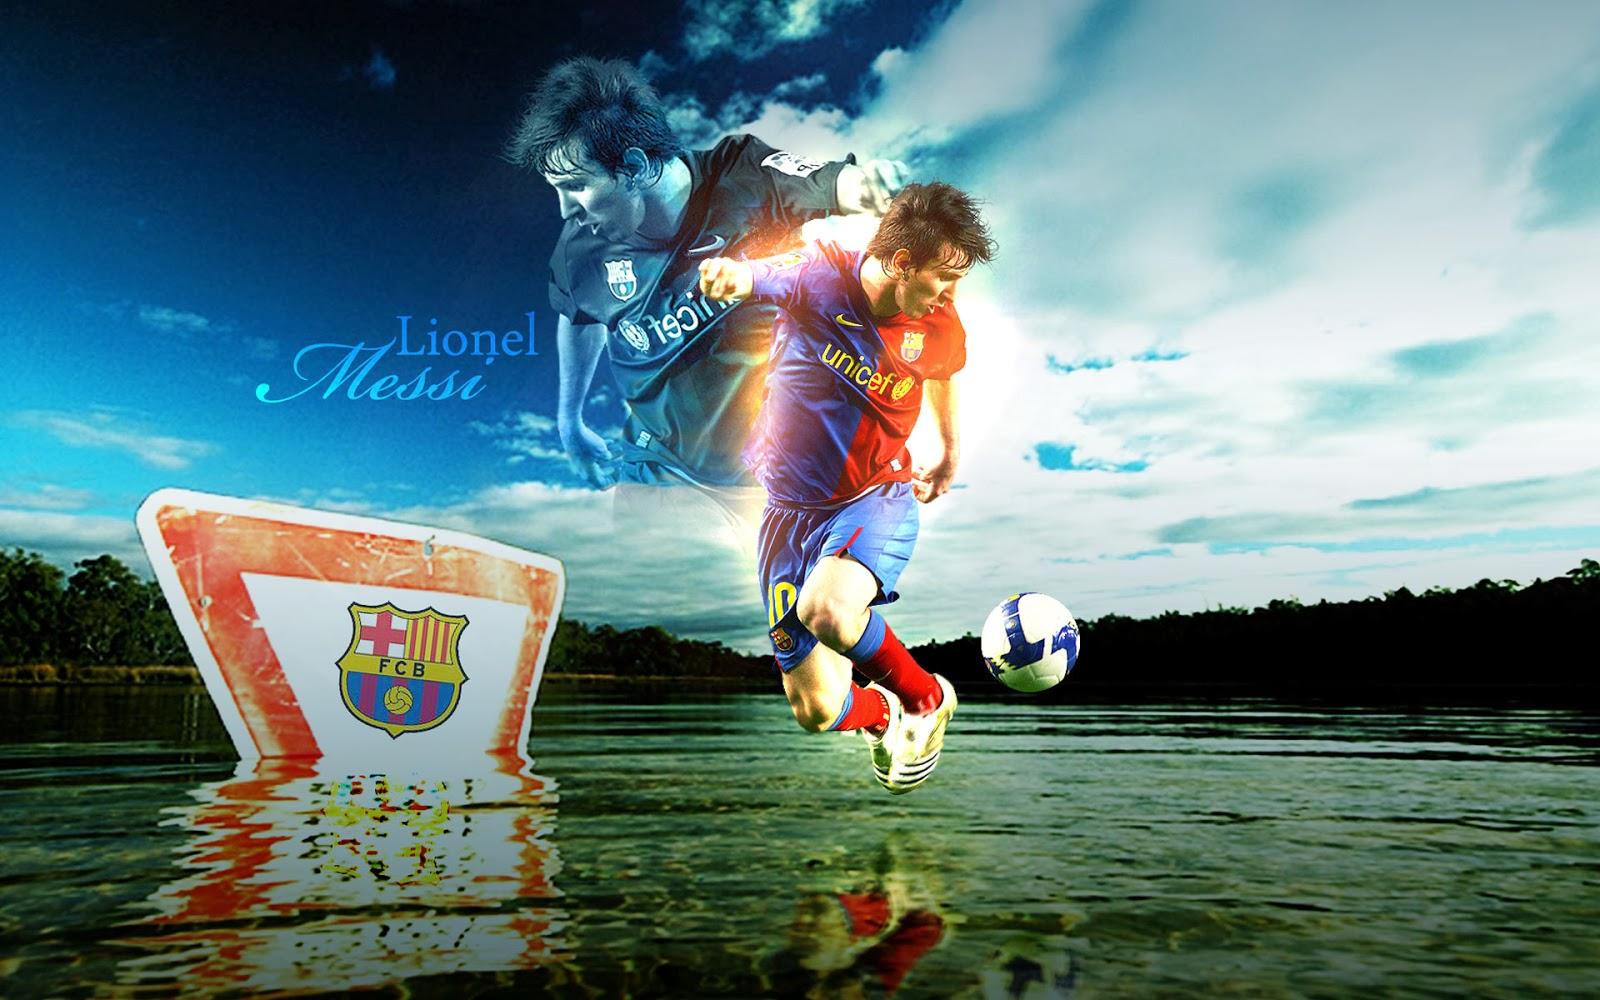 Lionel Messi Barcelona New HD Wallpaper 2013-2014